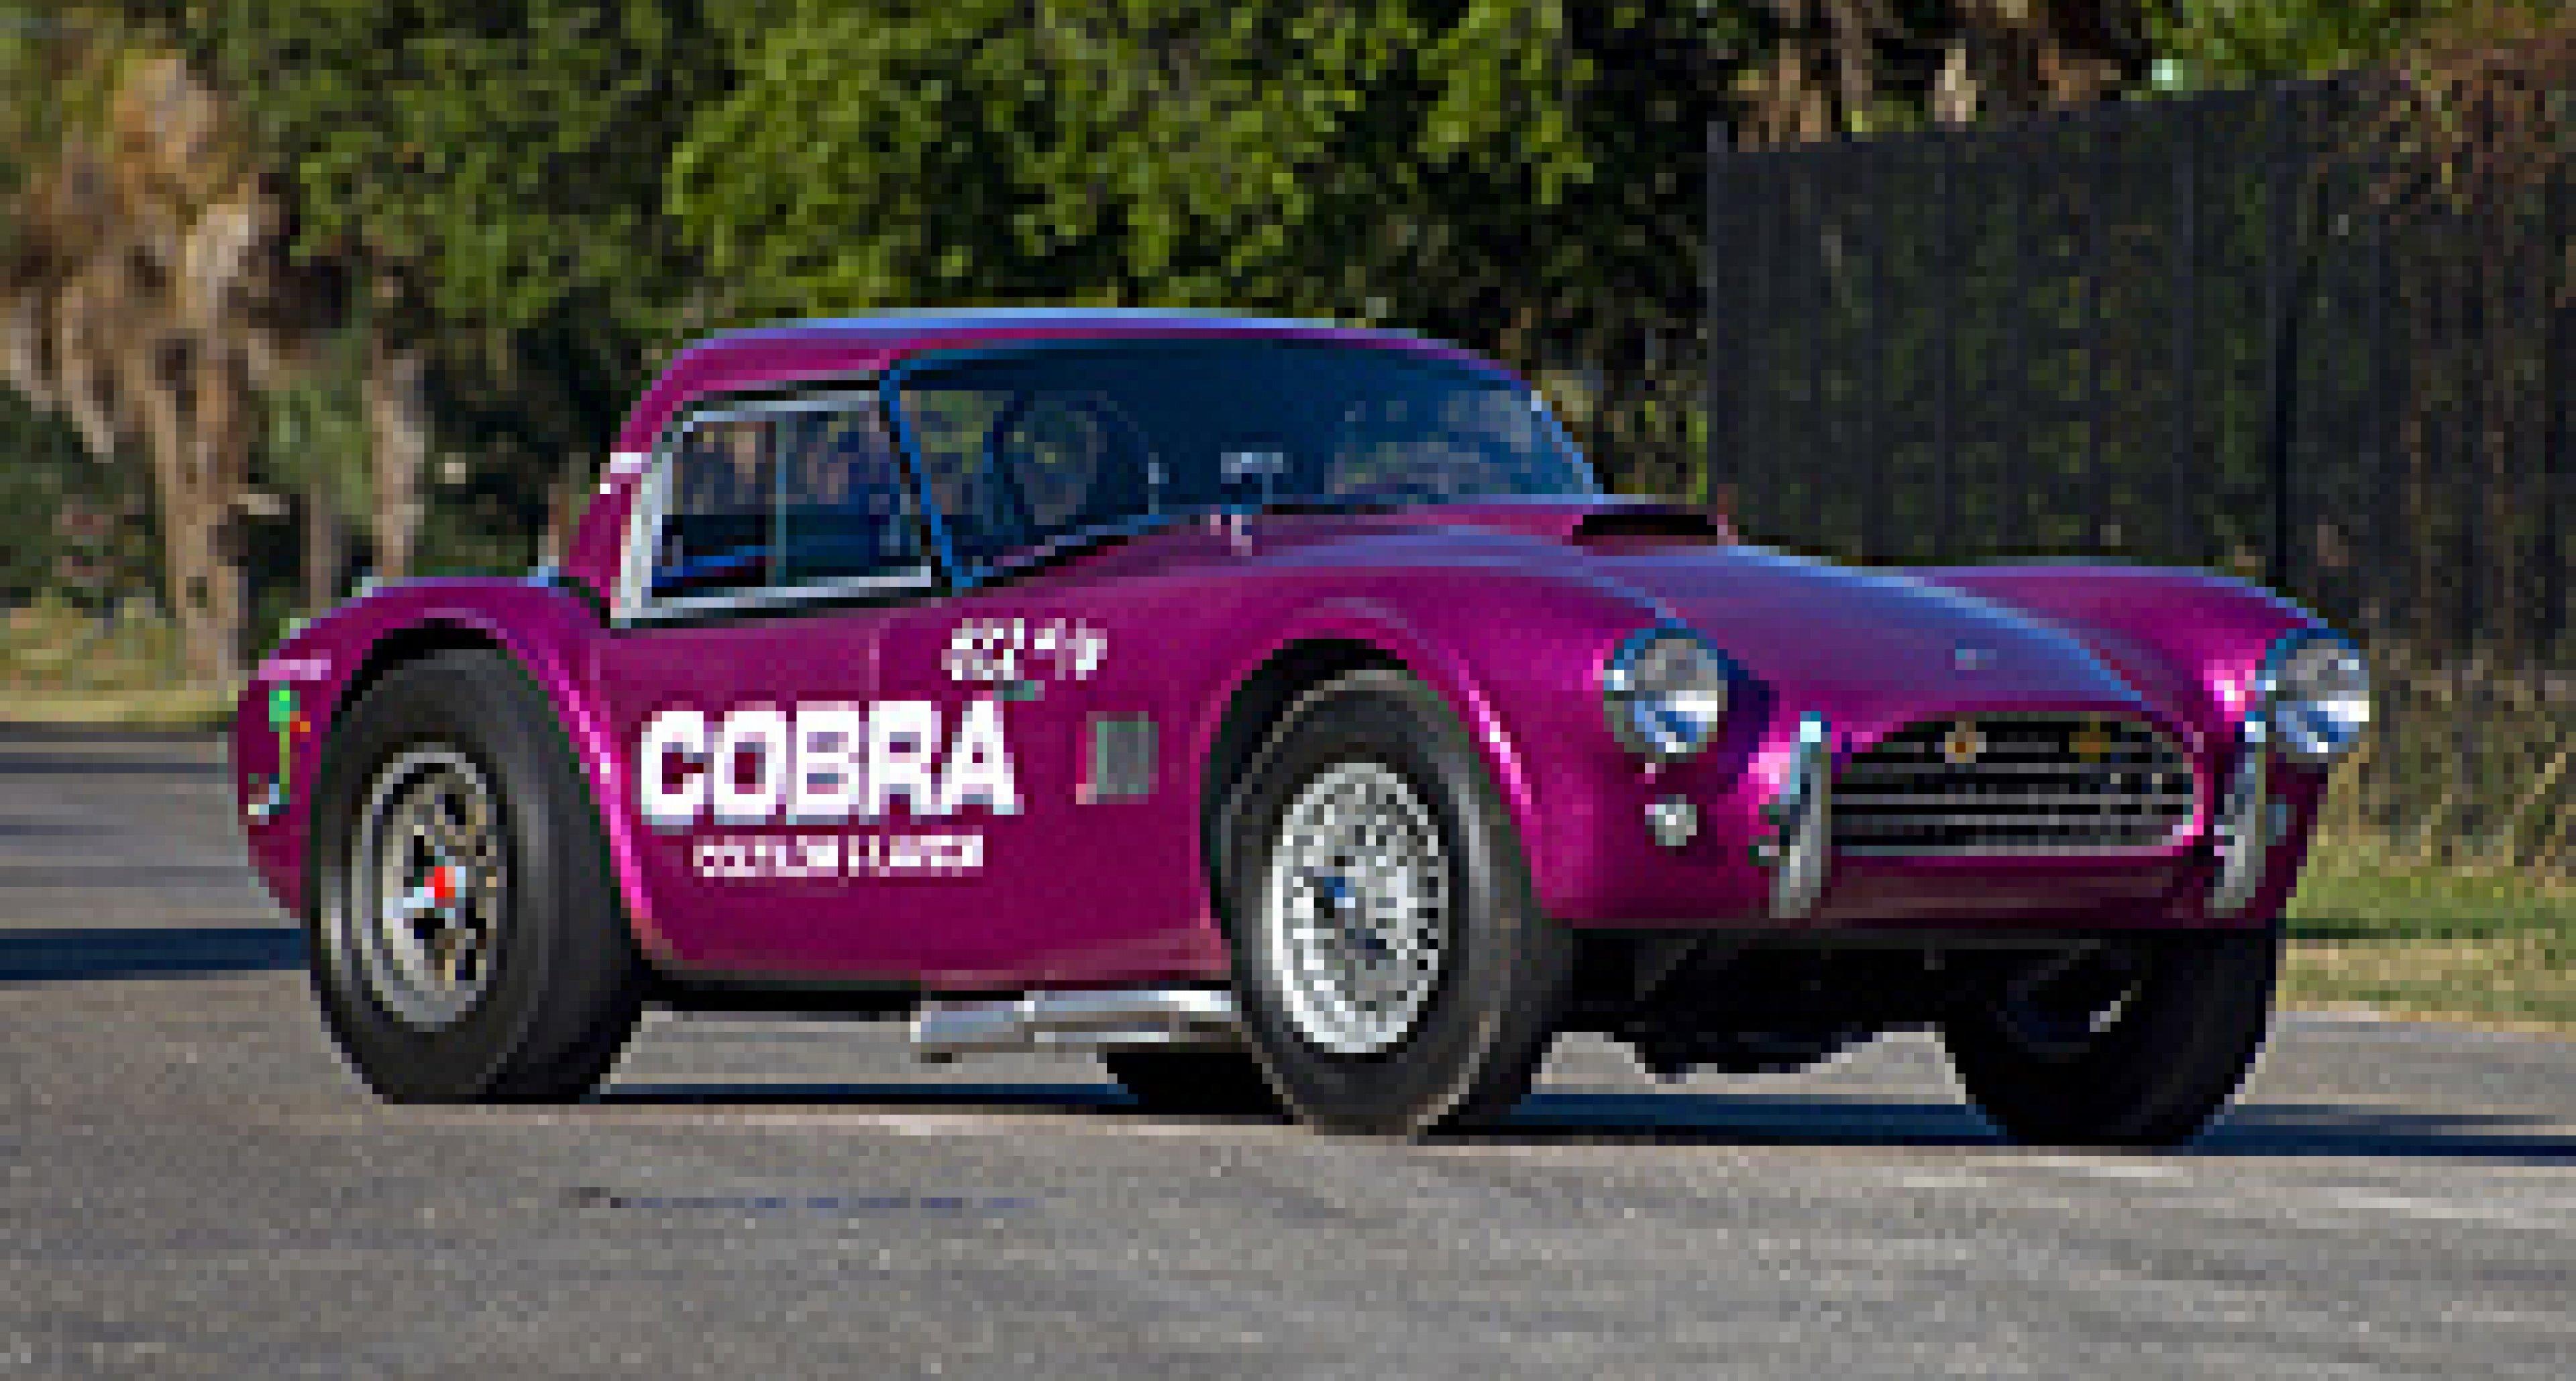 Mecum versteigert seltene Dragonsnake-Cobra